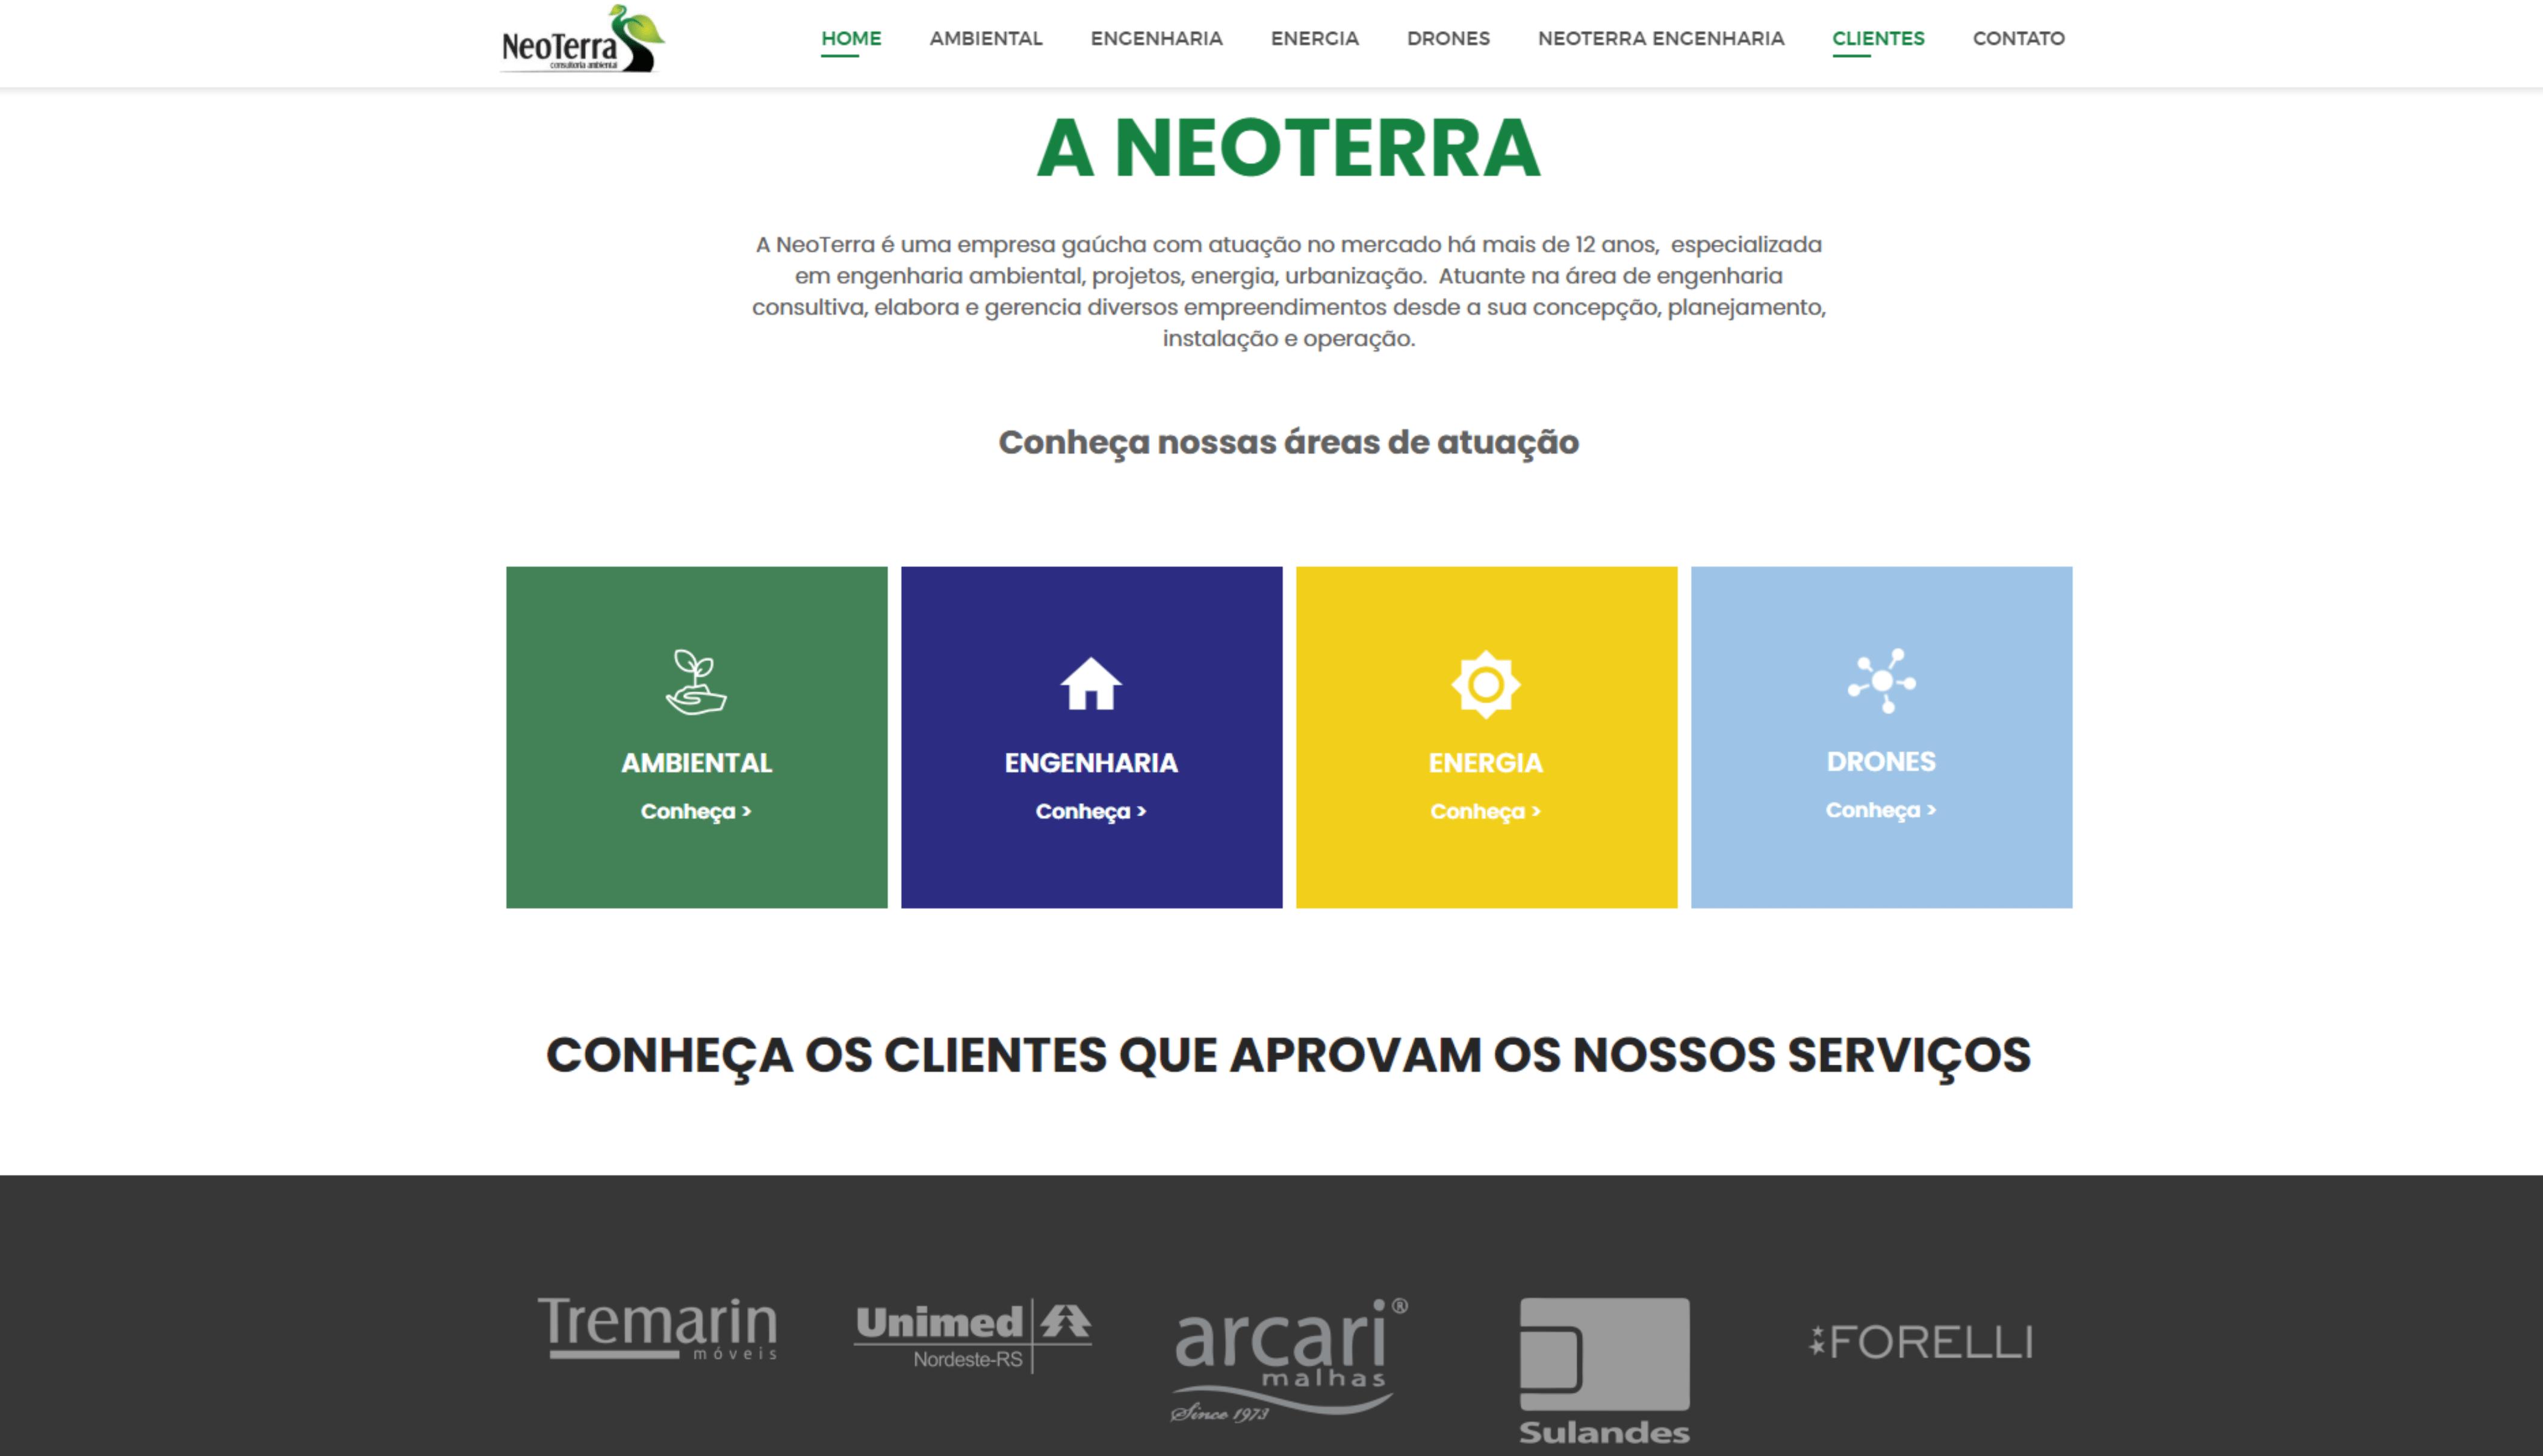 https://www.6i.com.br/case/neoterra/